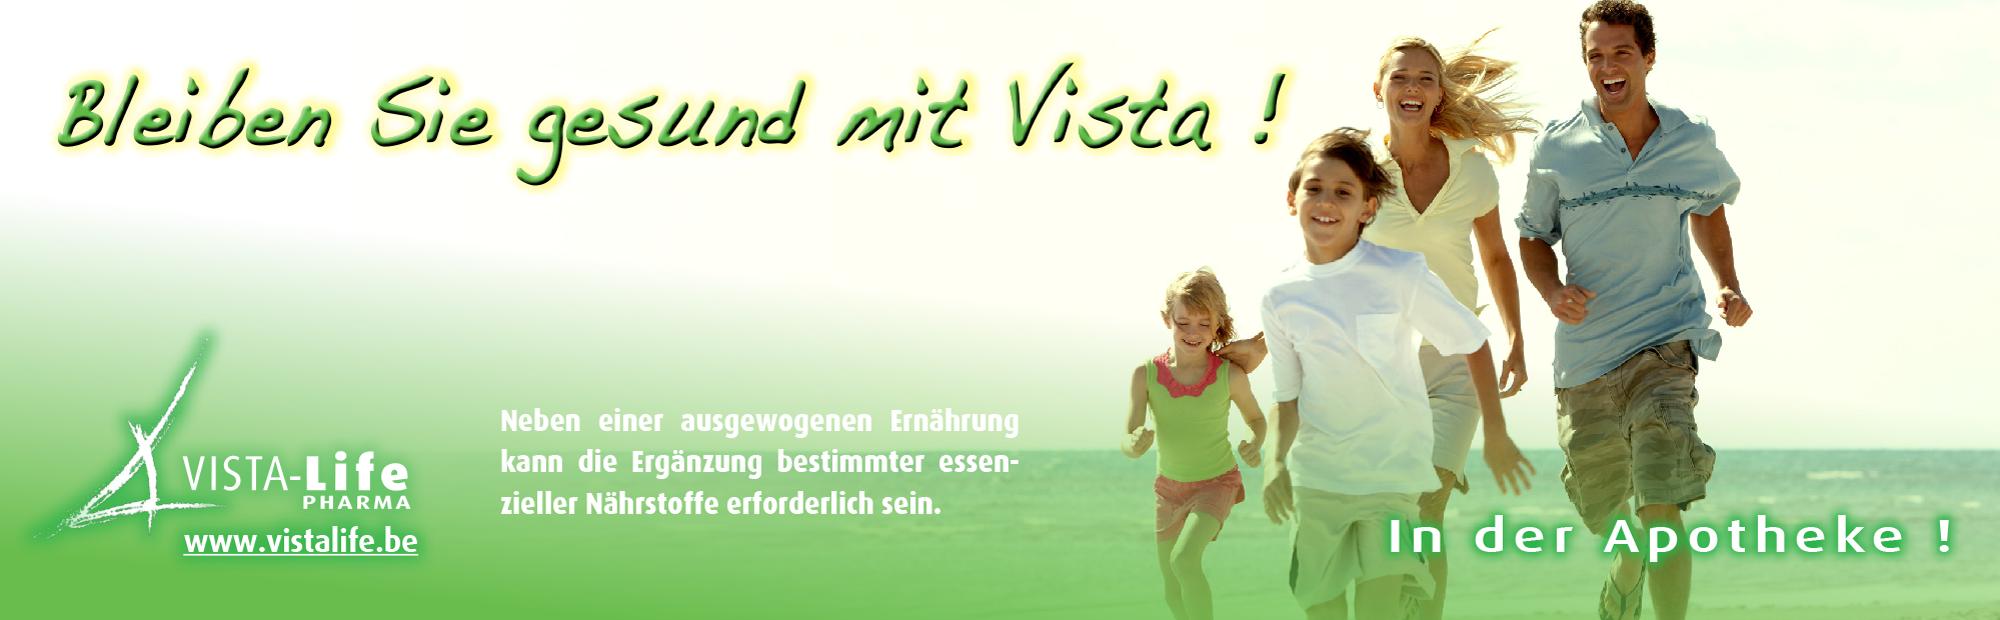 vista-life-pharma-(topbanner)3dui